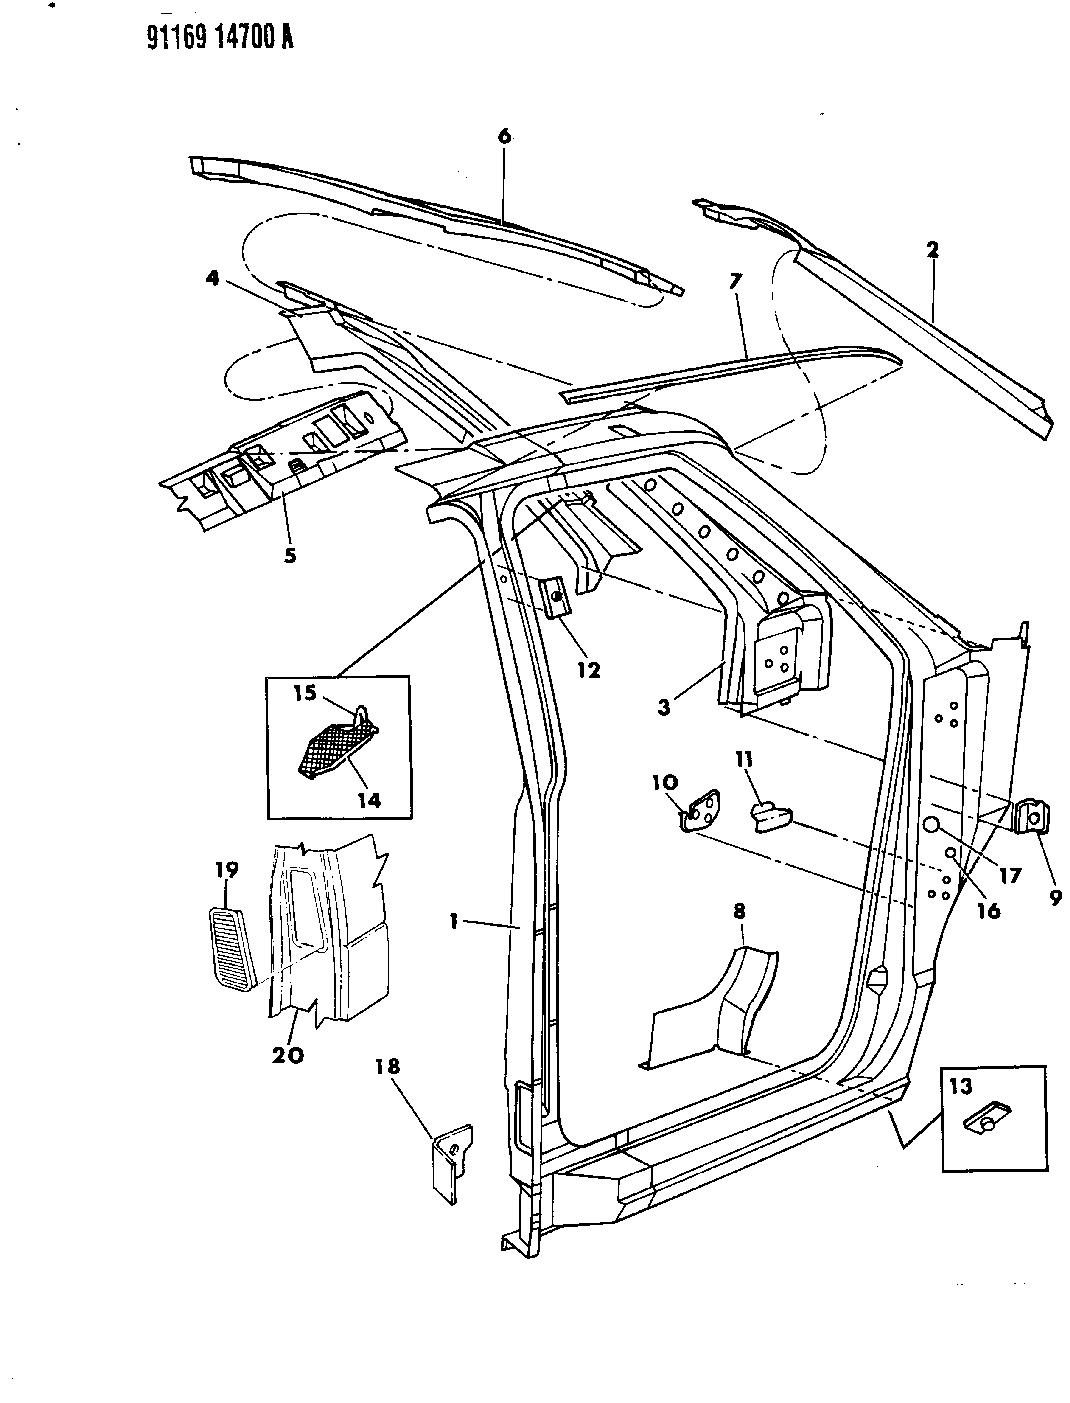 1991 Dodge Caravan Body Front Pillar Aperture Panel Fuse Box